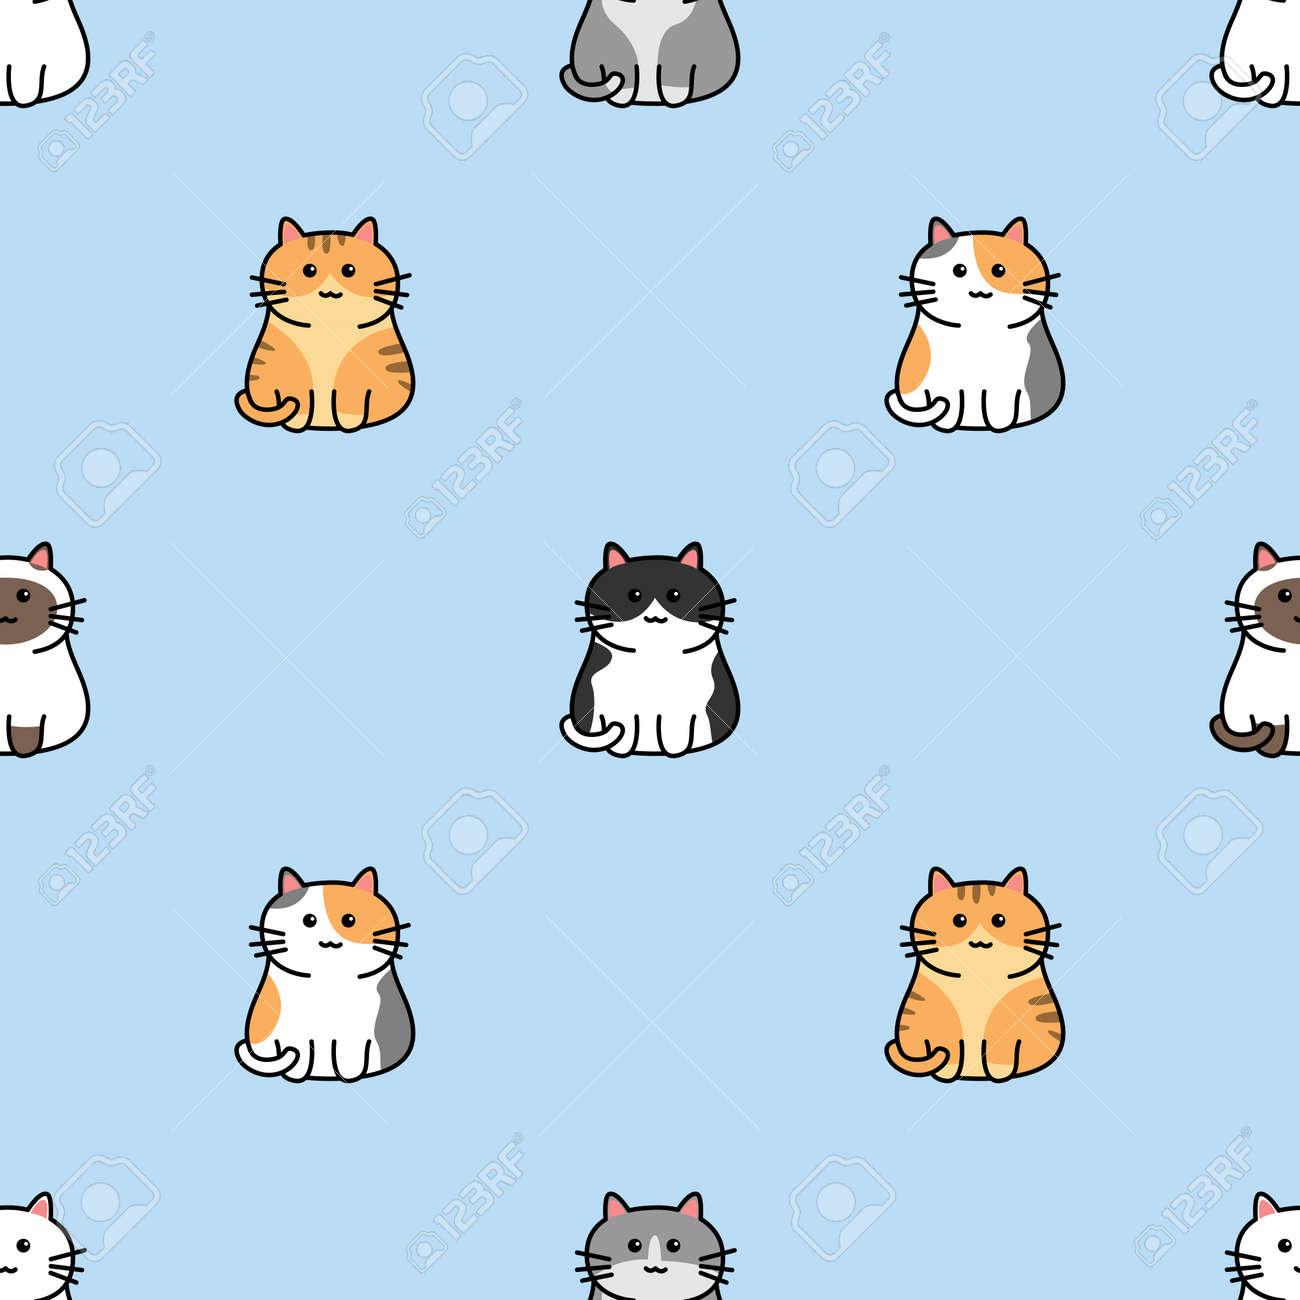 Cute cat cartoon seamless pattern, vector illustration - 169151635